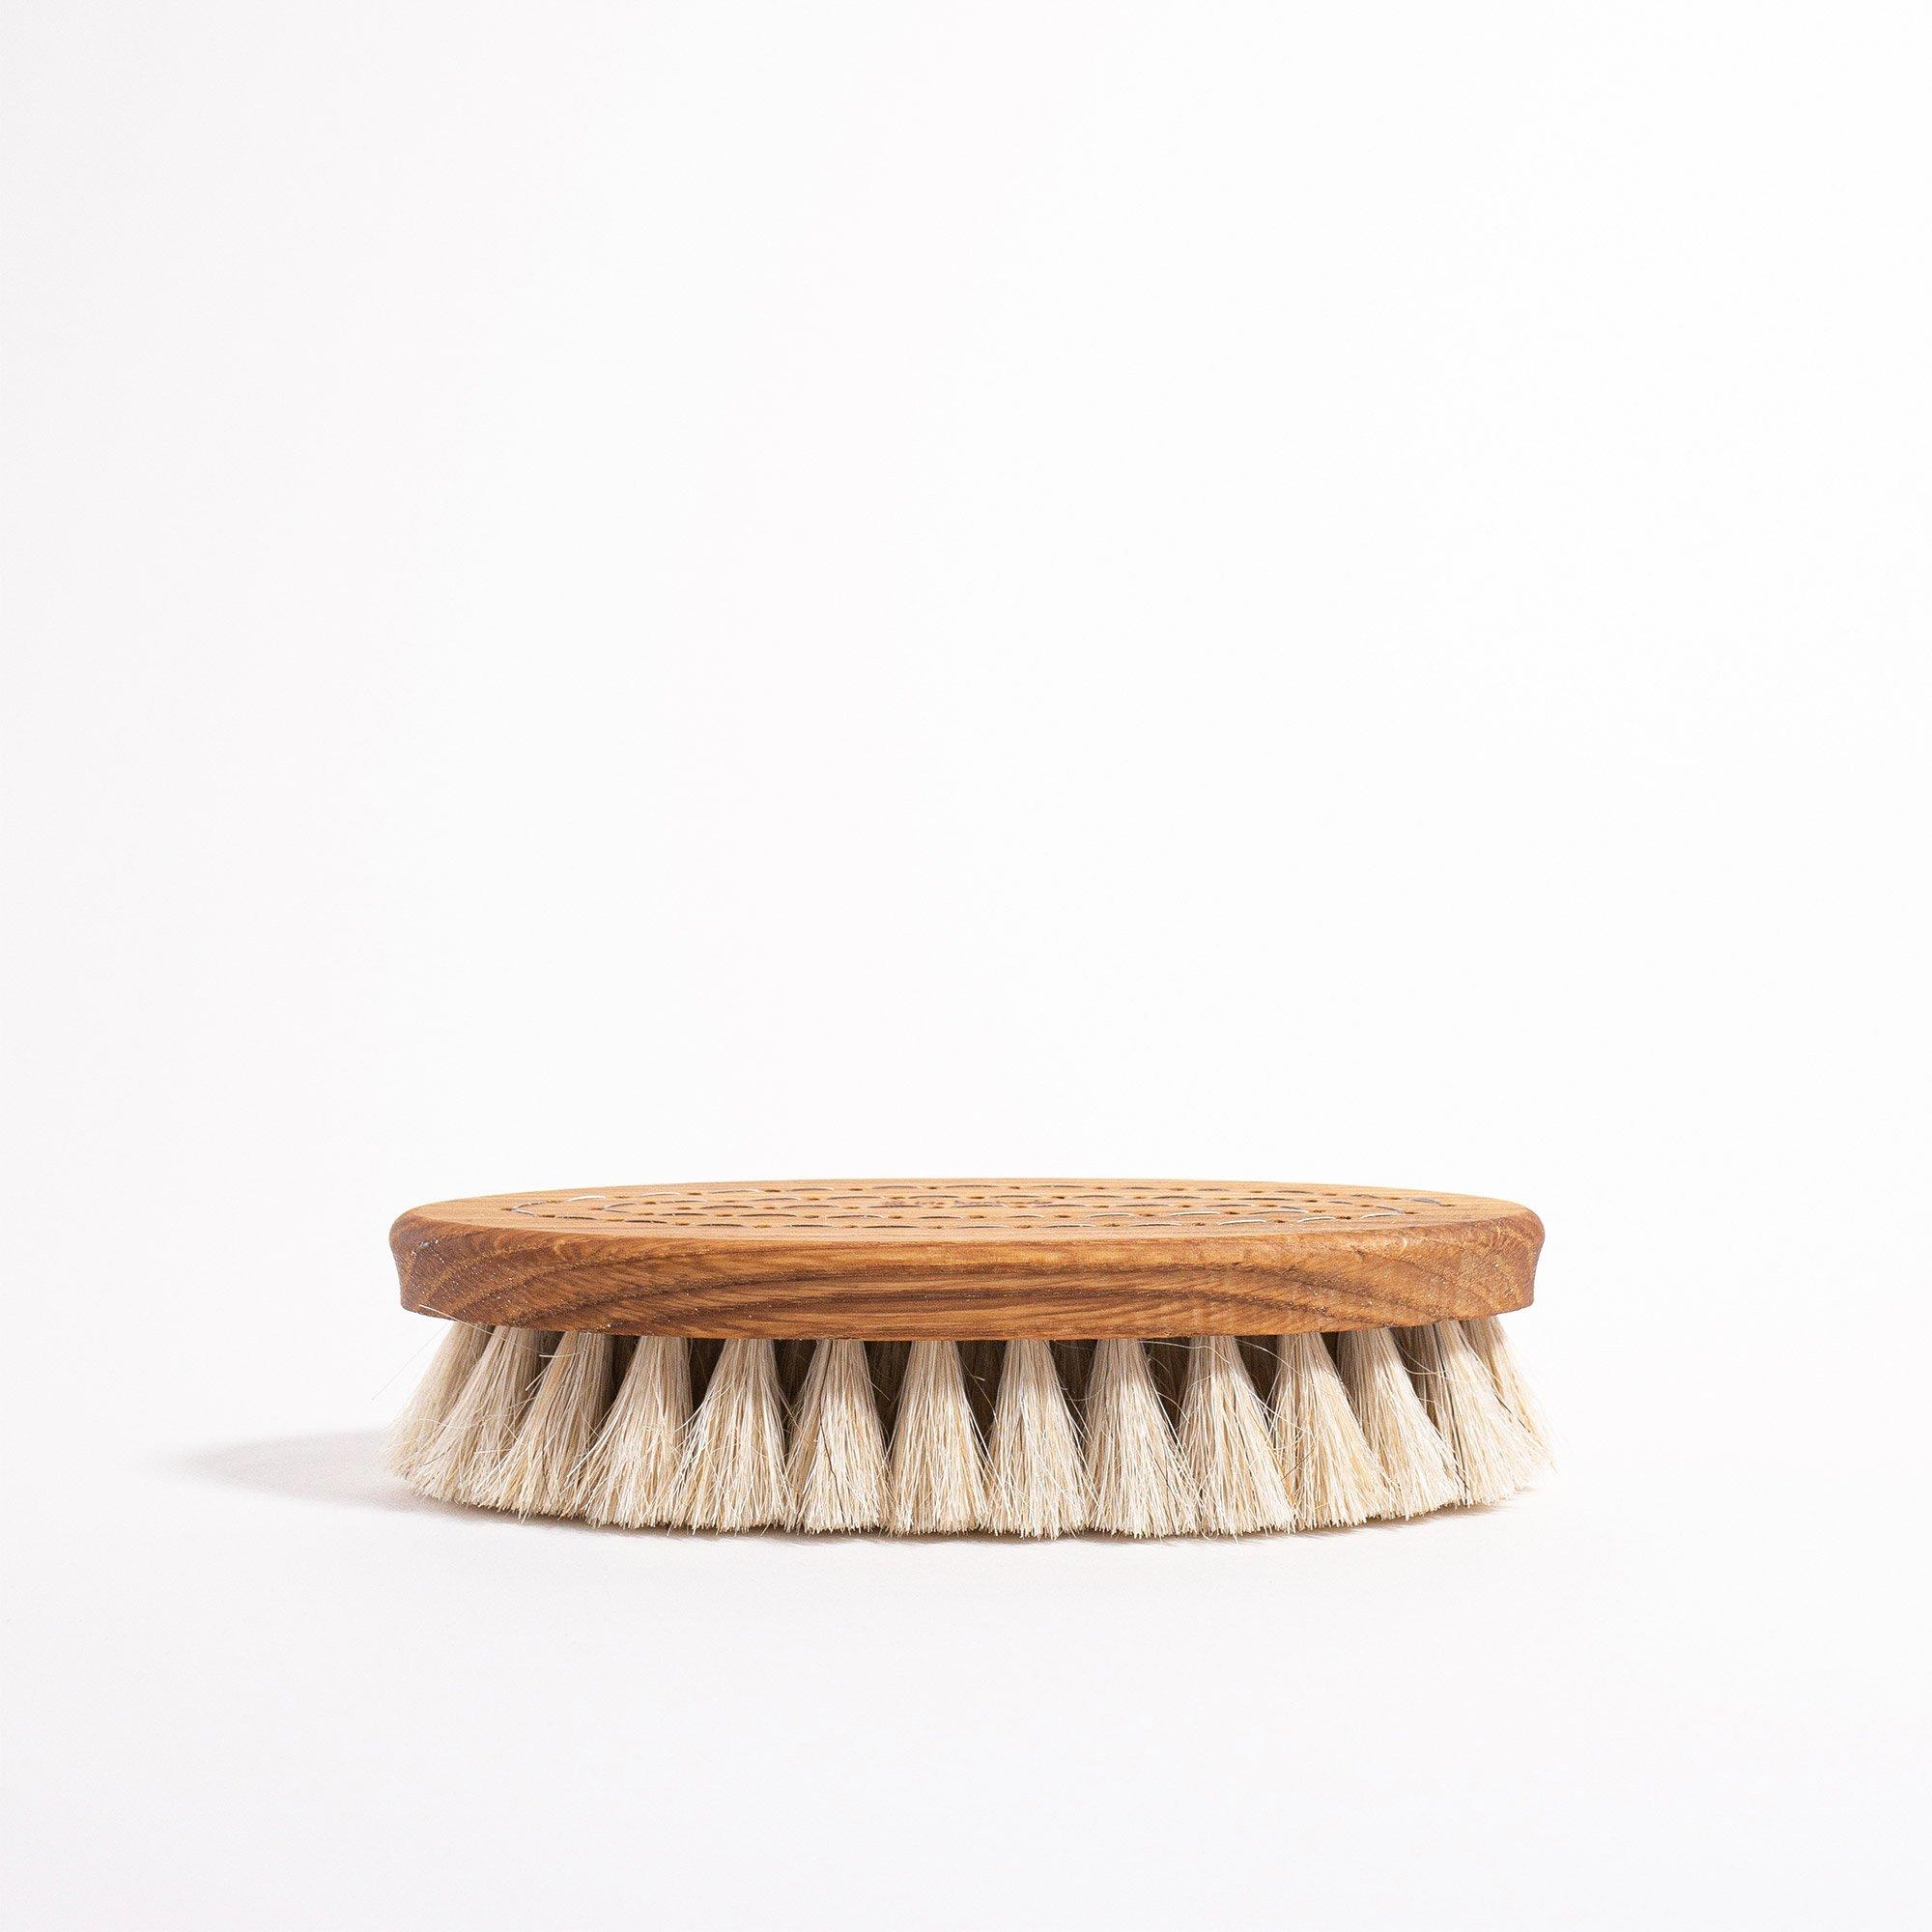 Grace and Green - Iris Hantverk - Bath Brush without Handle 1